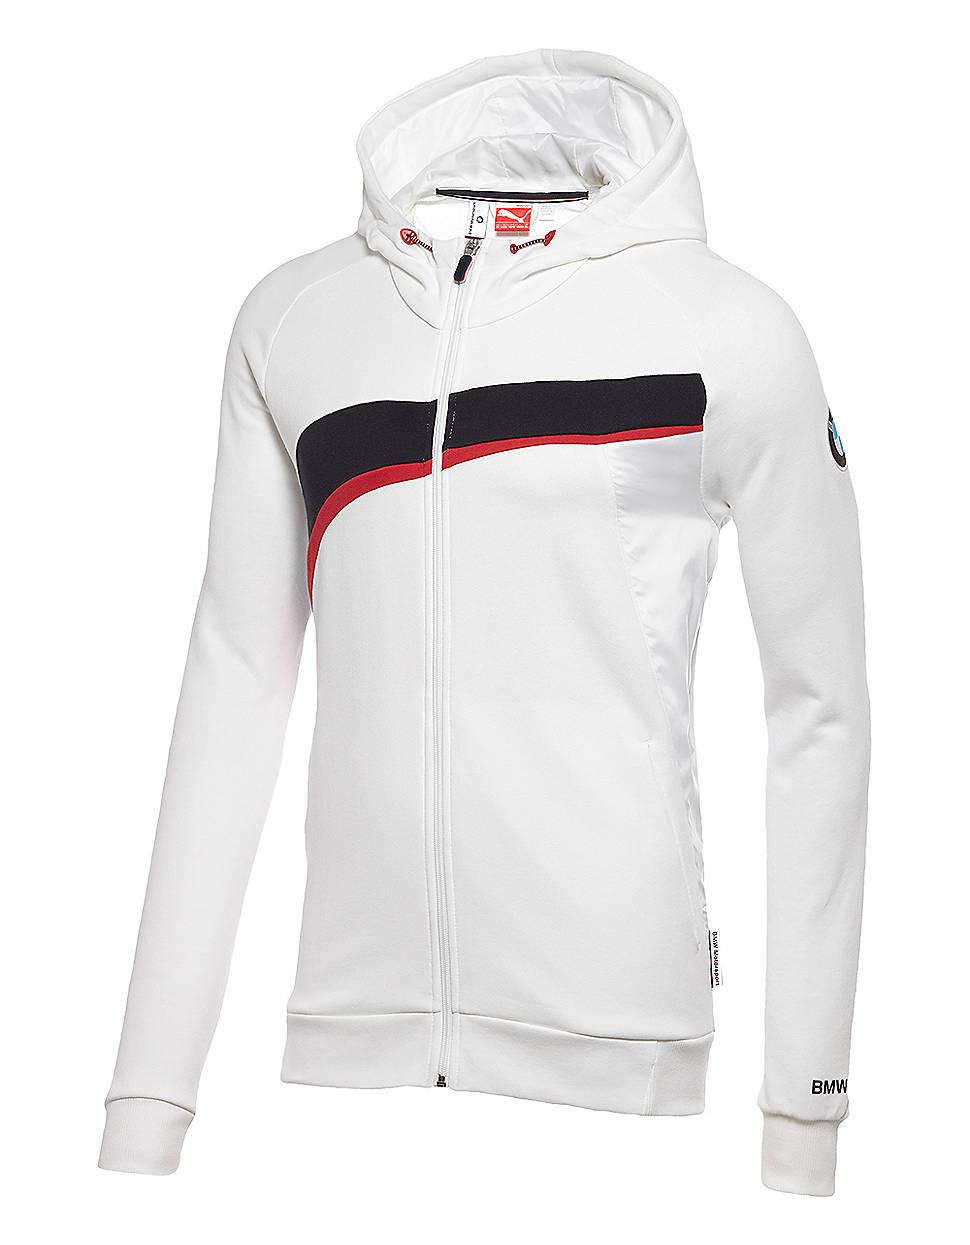 puma bmw hooded sweat jacket in white for men lyst. Black Bedroom Furniture Sets. Home Design Ideas